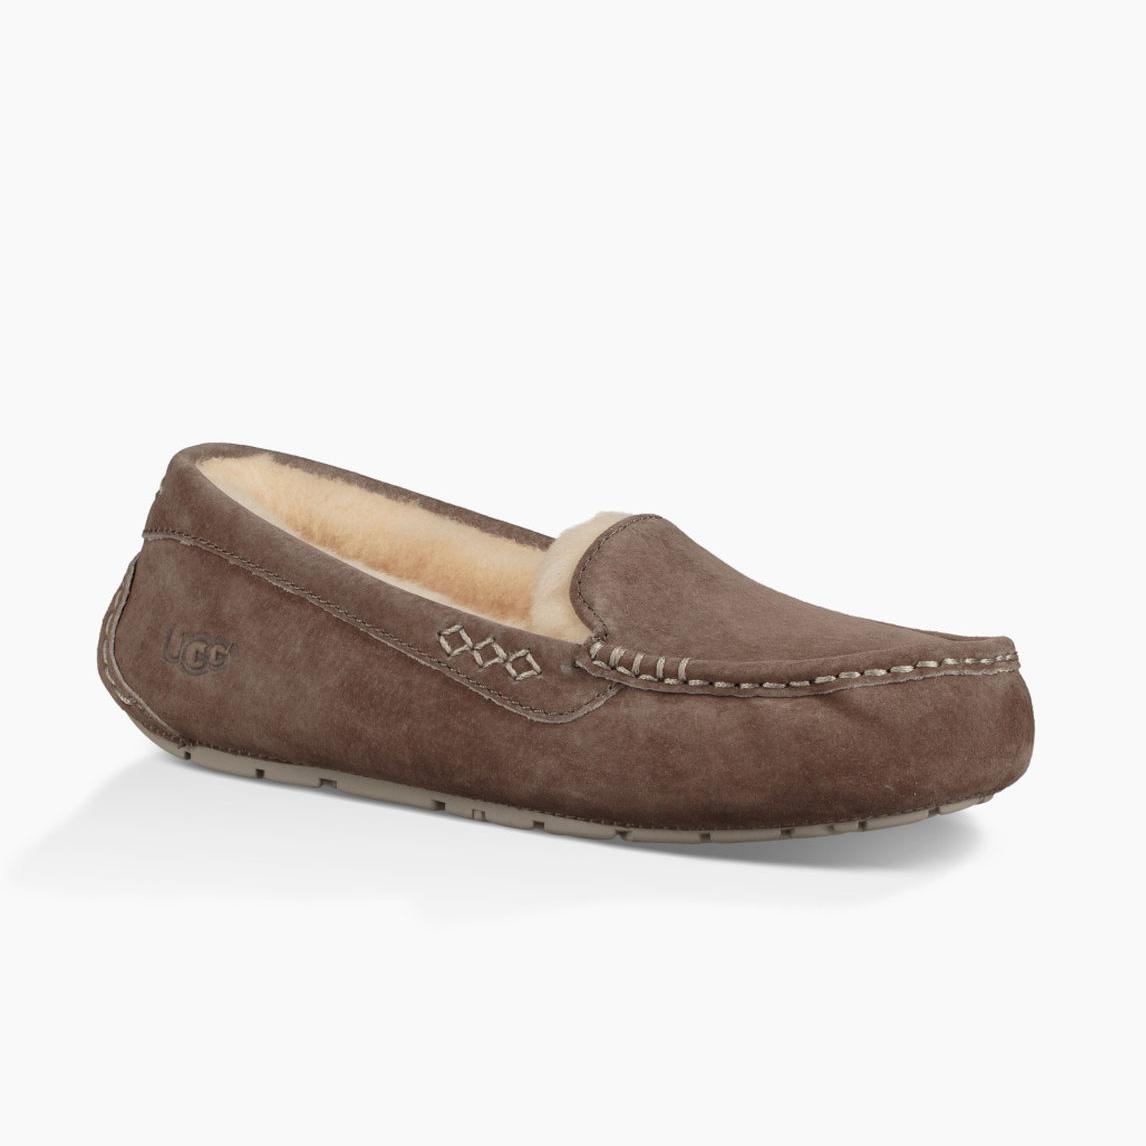 e9e71af007d UGG Women's Ansley Wool Slippers Slate